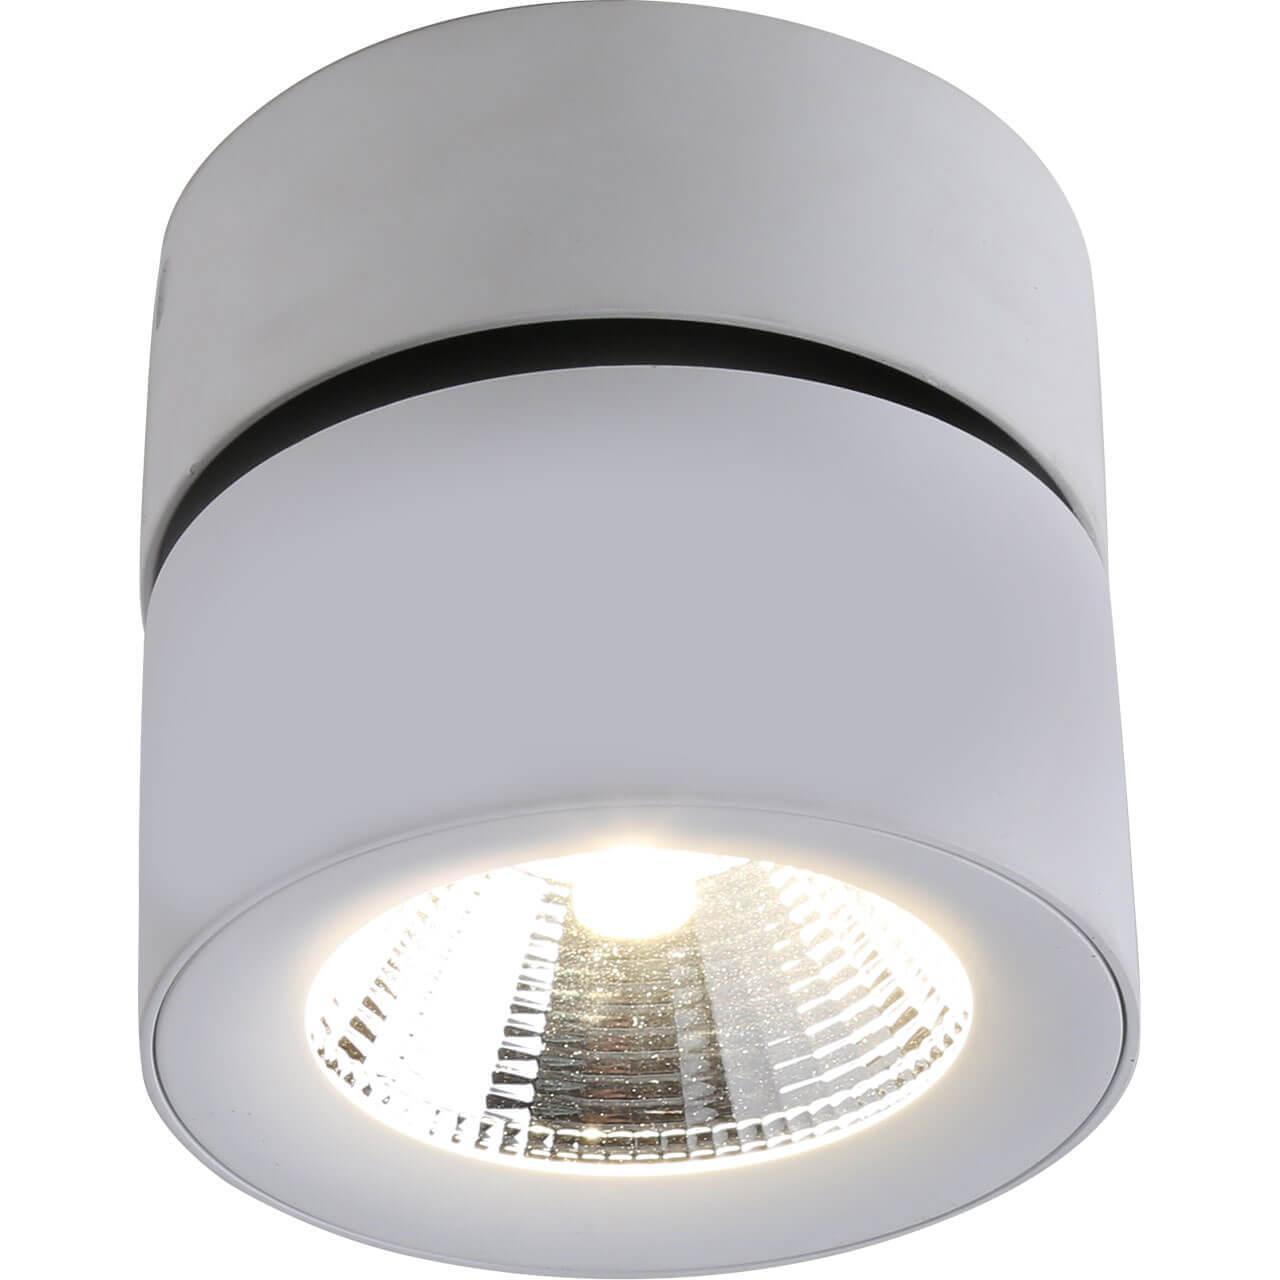 Спот Divinare 1295/03 PL-1, LED, 10 Вт цена 2017